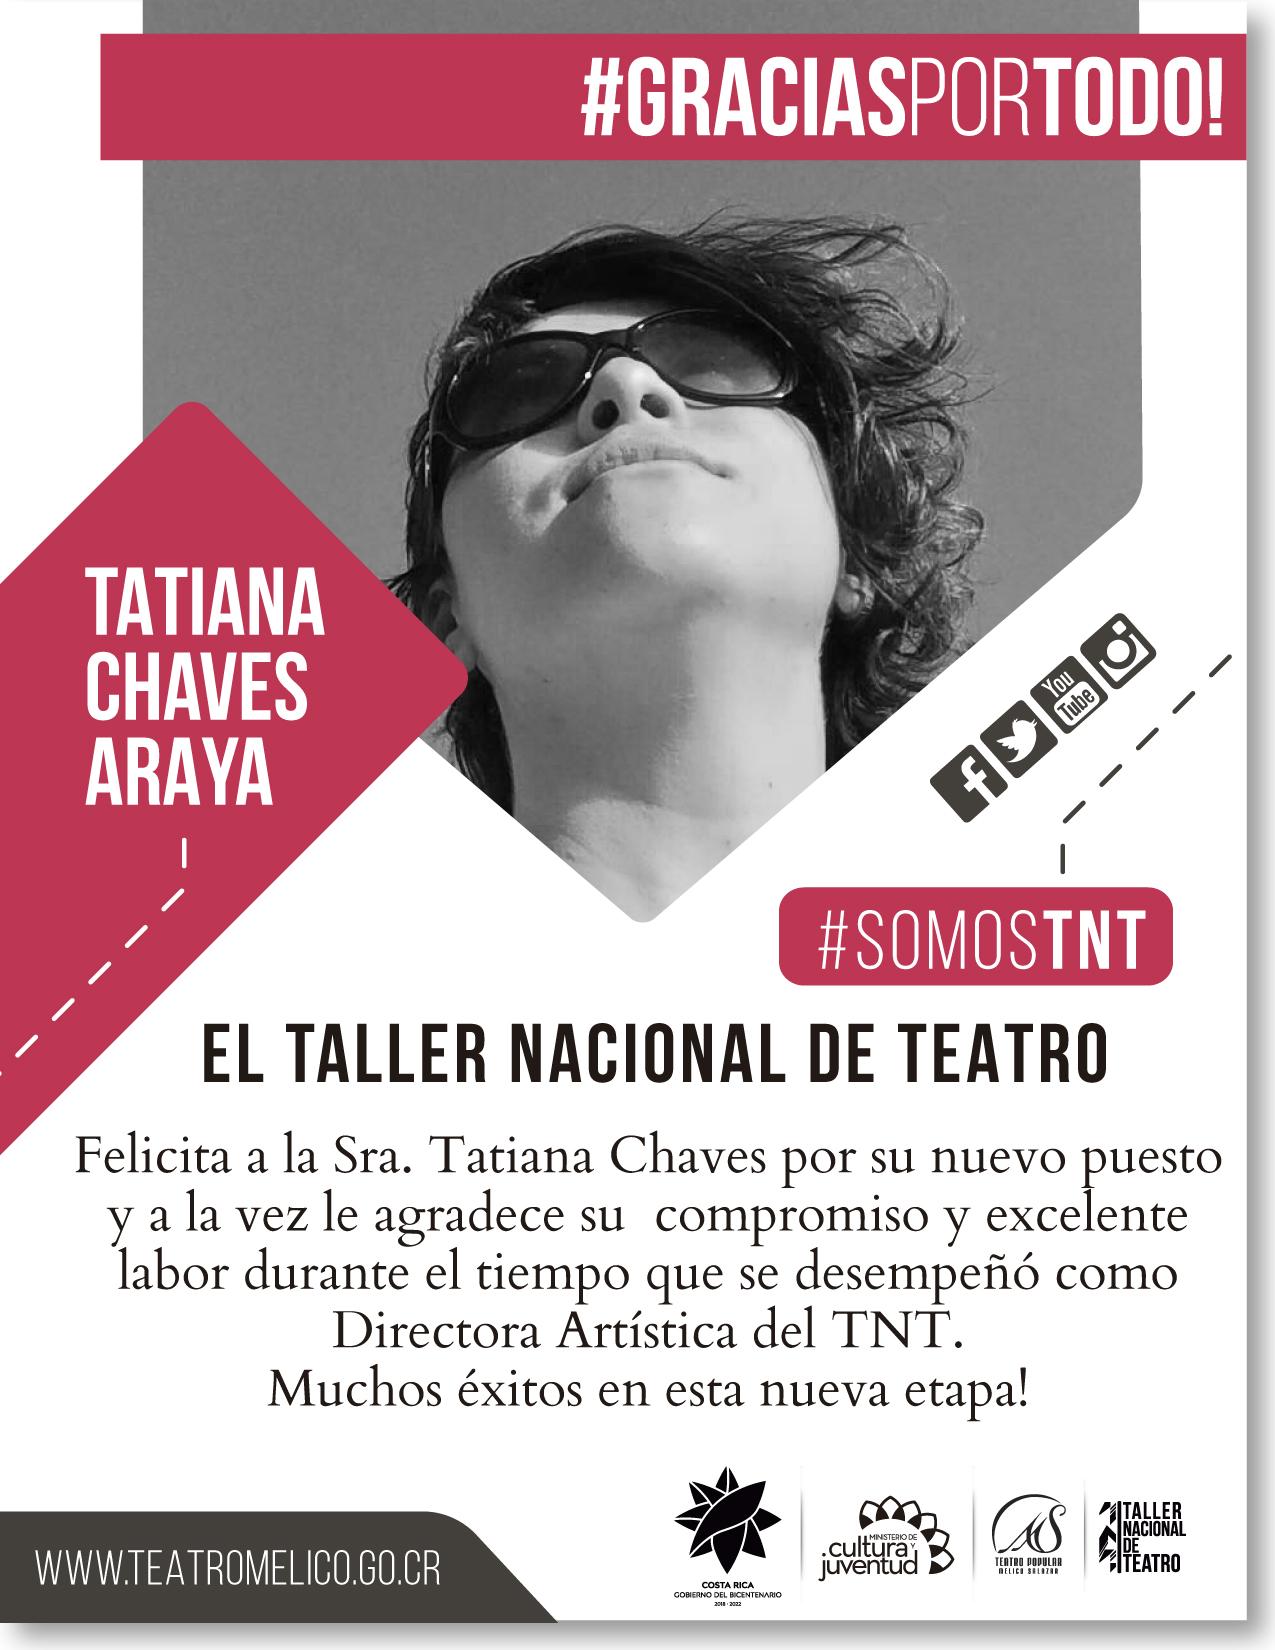 https://teatromelico.go.cr/images/GraciasTatiana-01.jpg